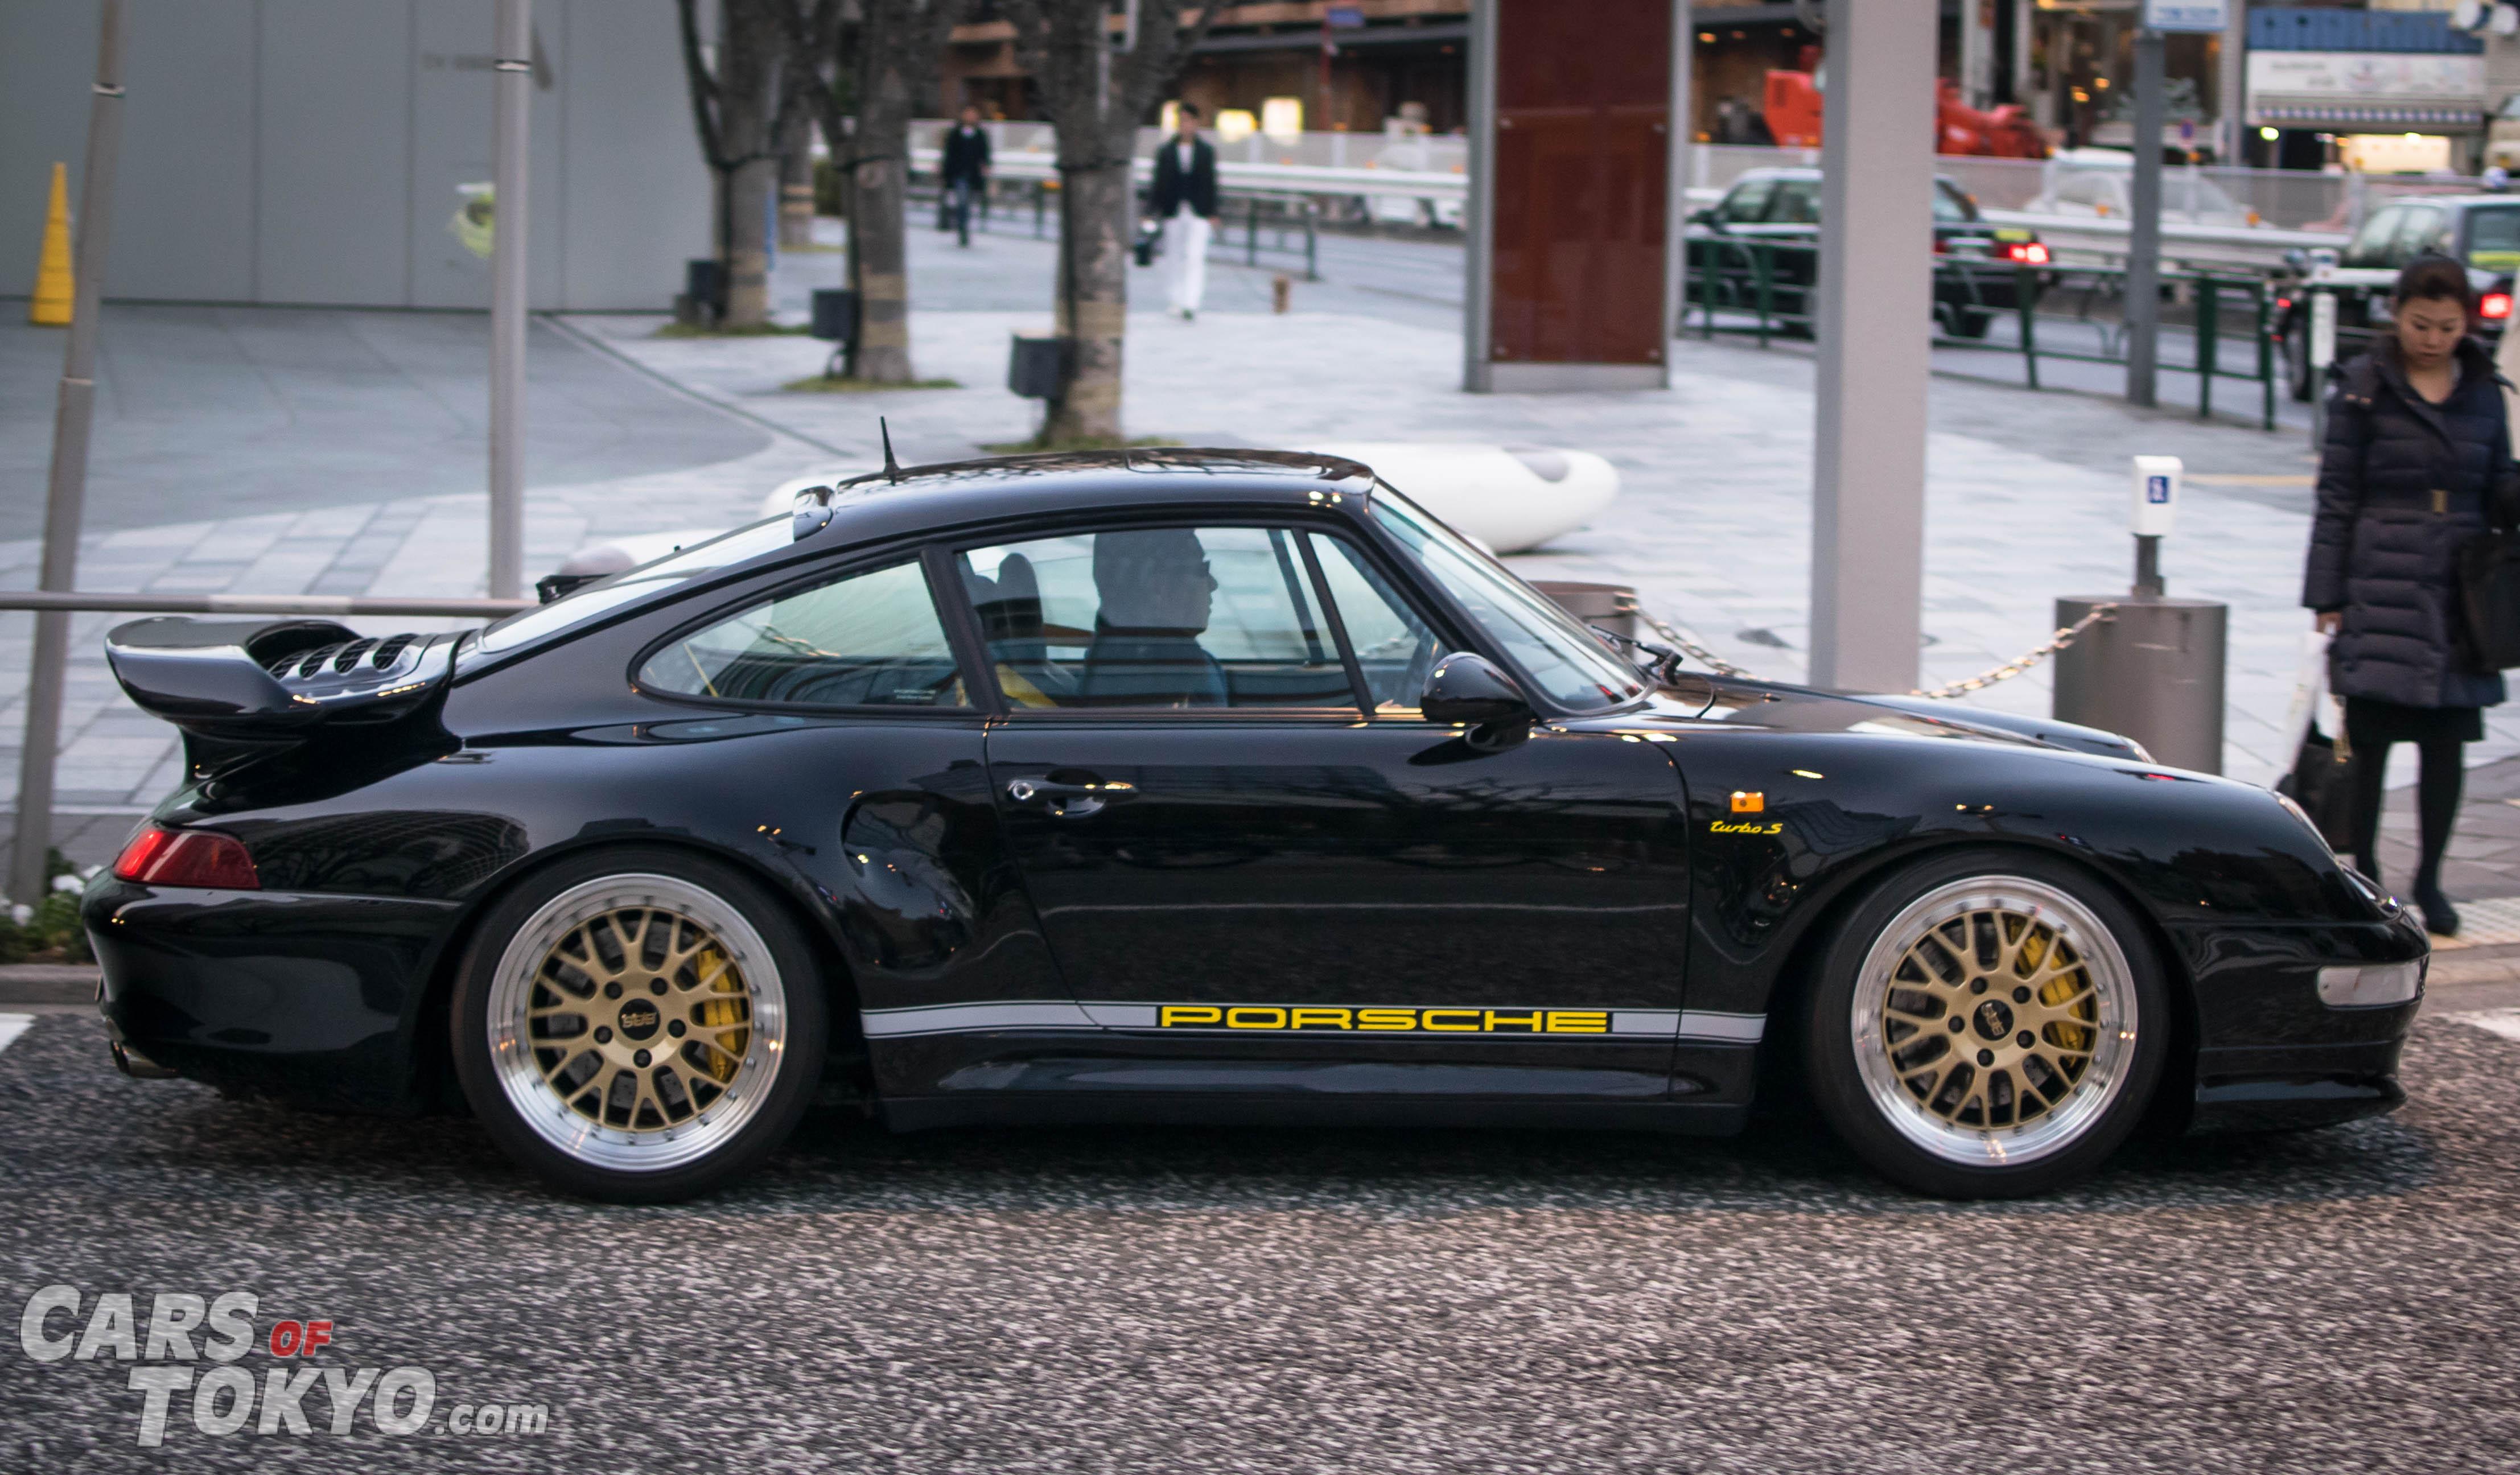 Cars of Tokyo Classic Porsche 911 Turbo S